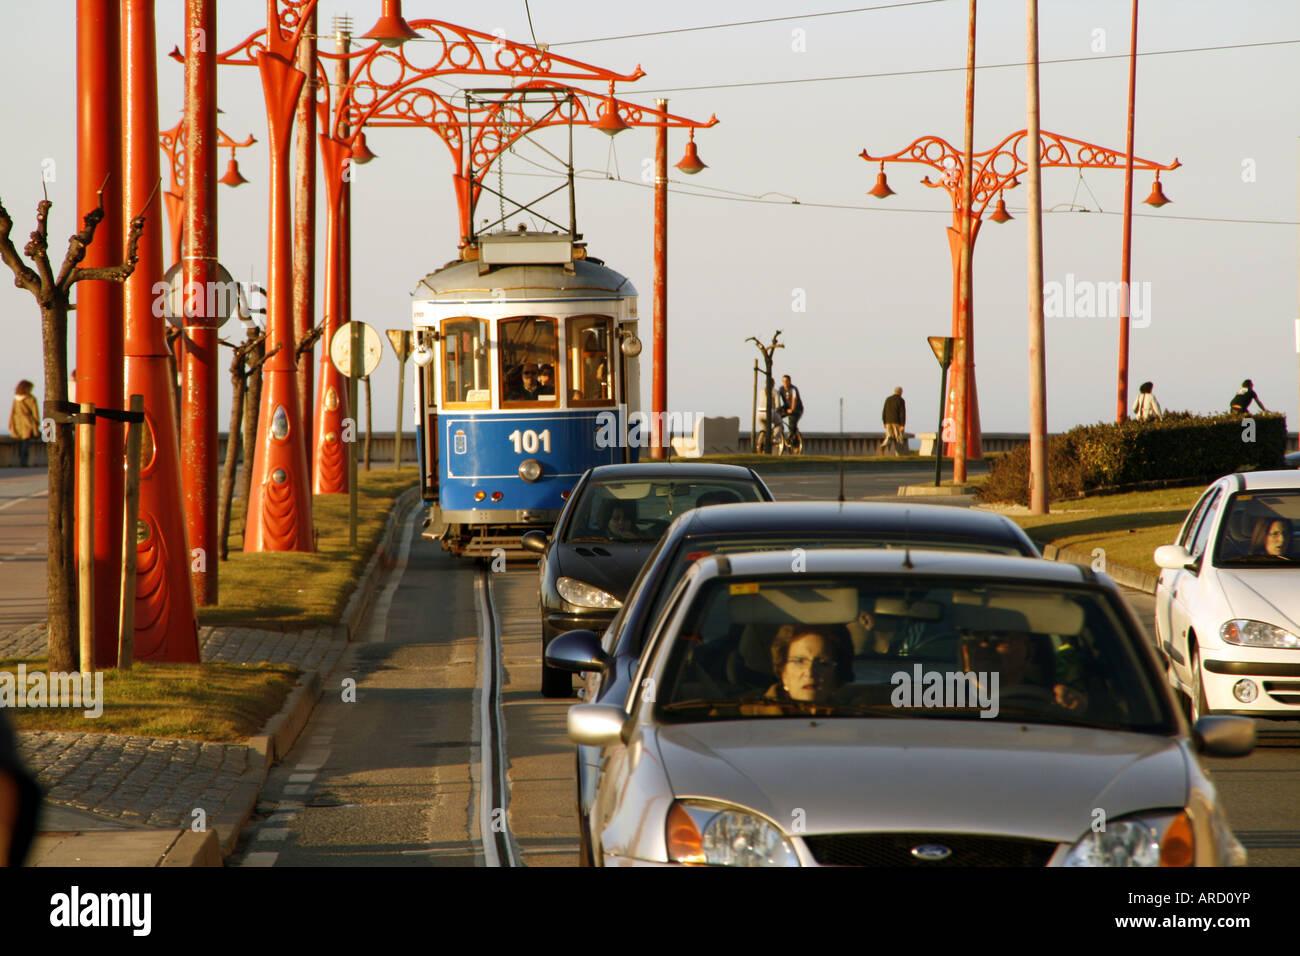 Tram in La Coruña, Spain. Made in England, run in Spain - Stock Image